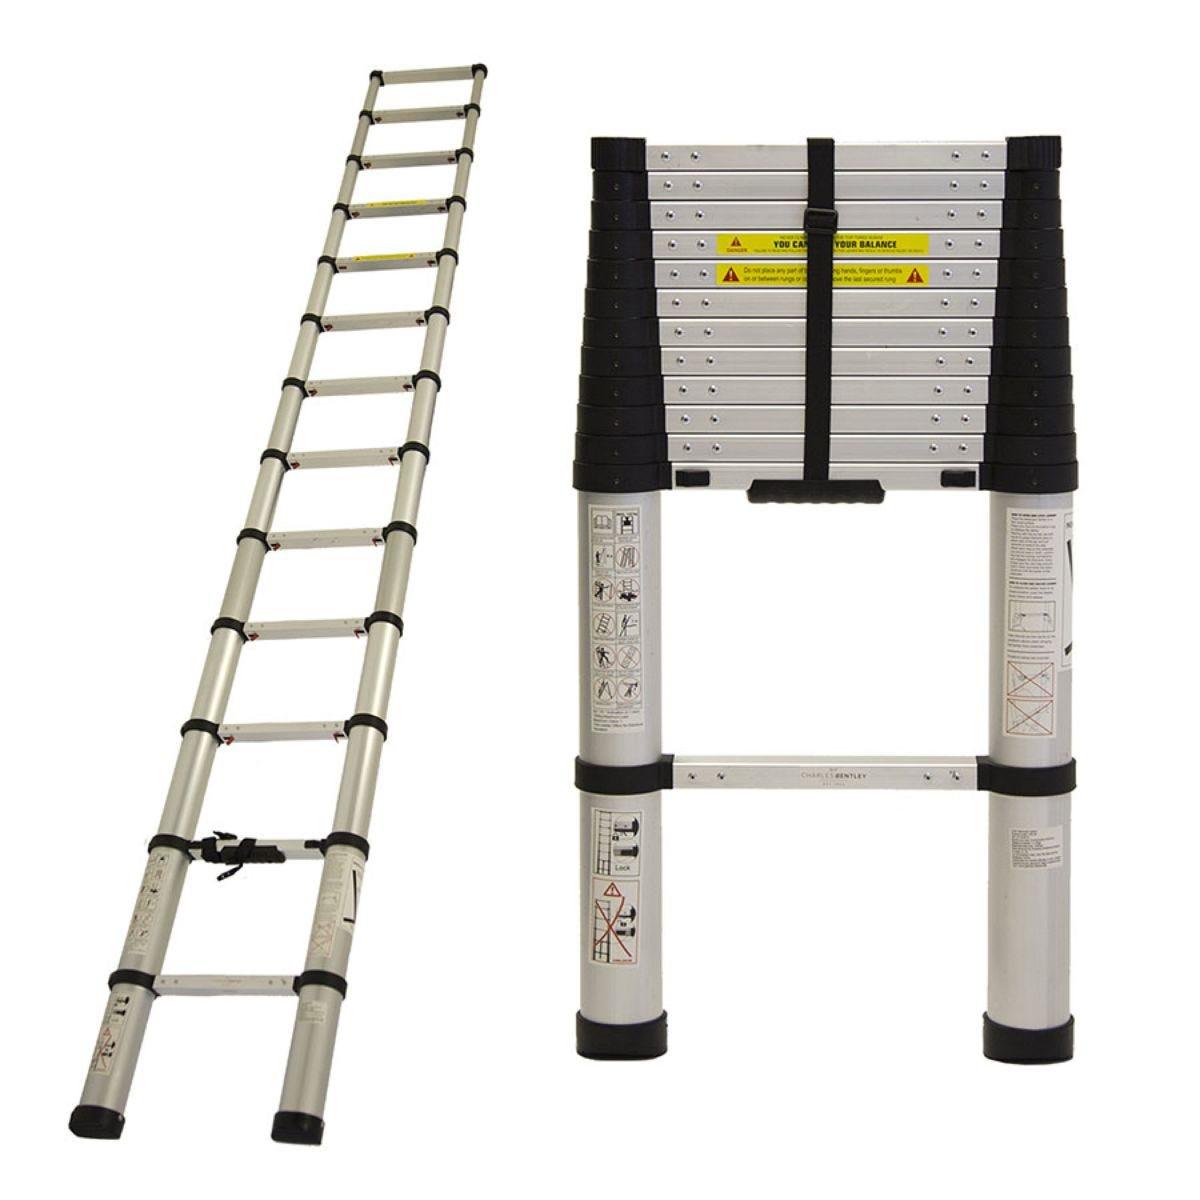 Charles Bentley 3.8m Telescopic Ladder